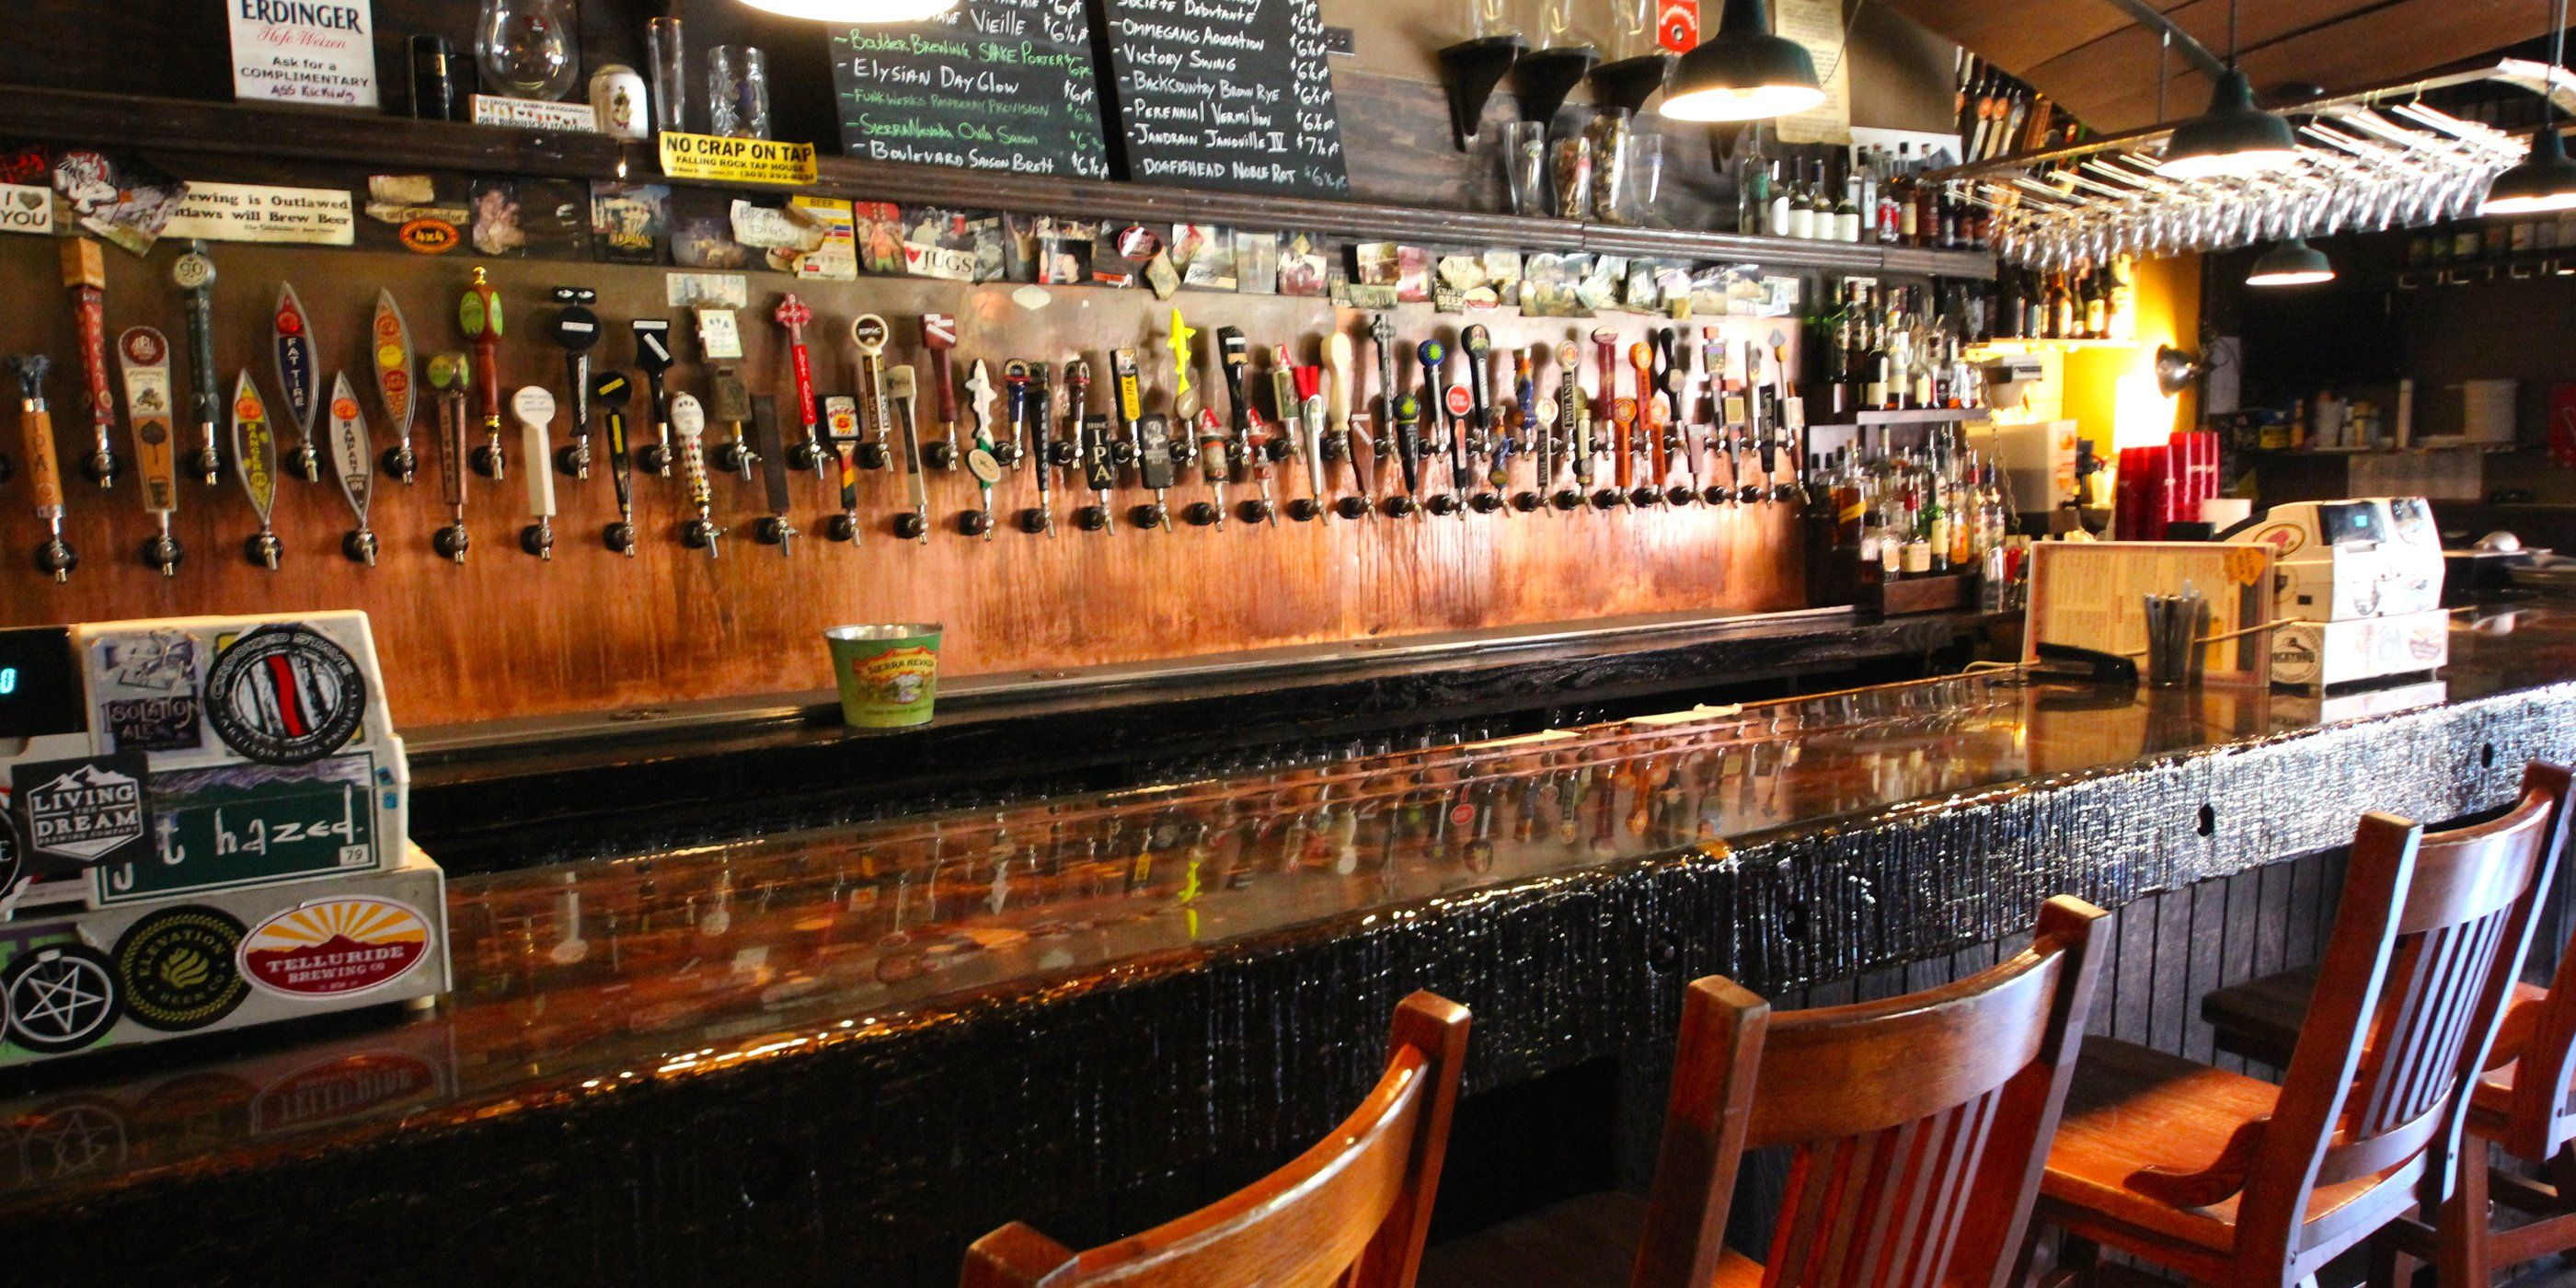 100 Taps Of Beer On The Wall Google Search Beer Bar Beer Room Best Beer